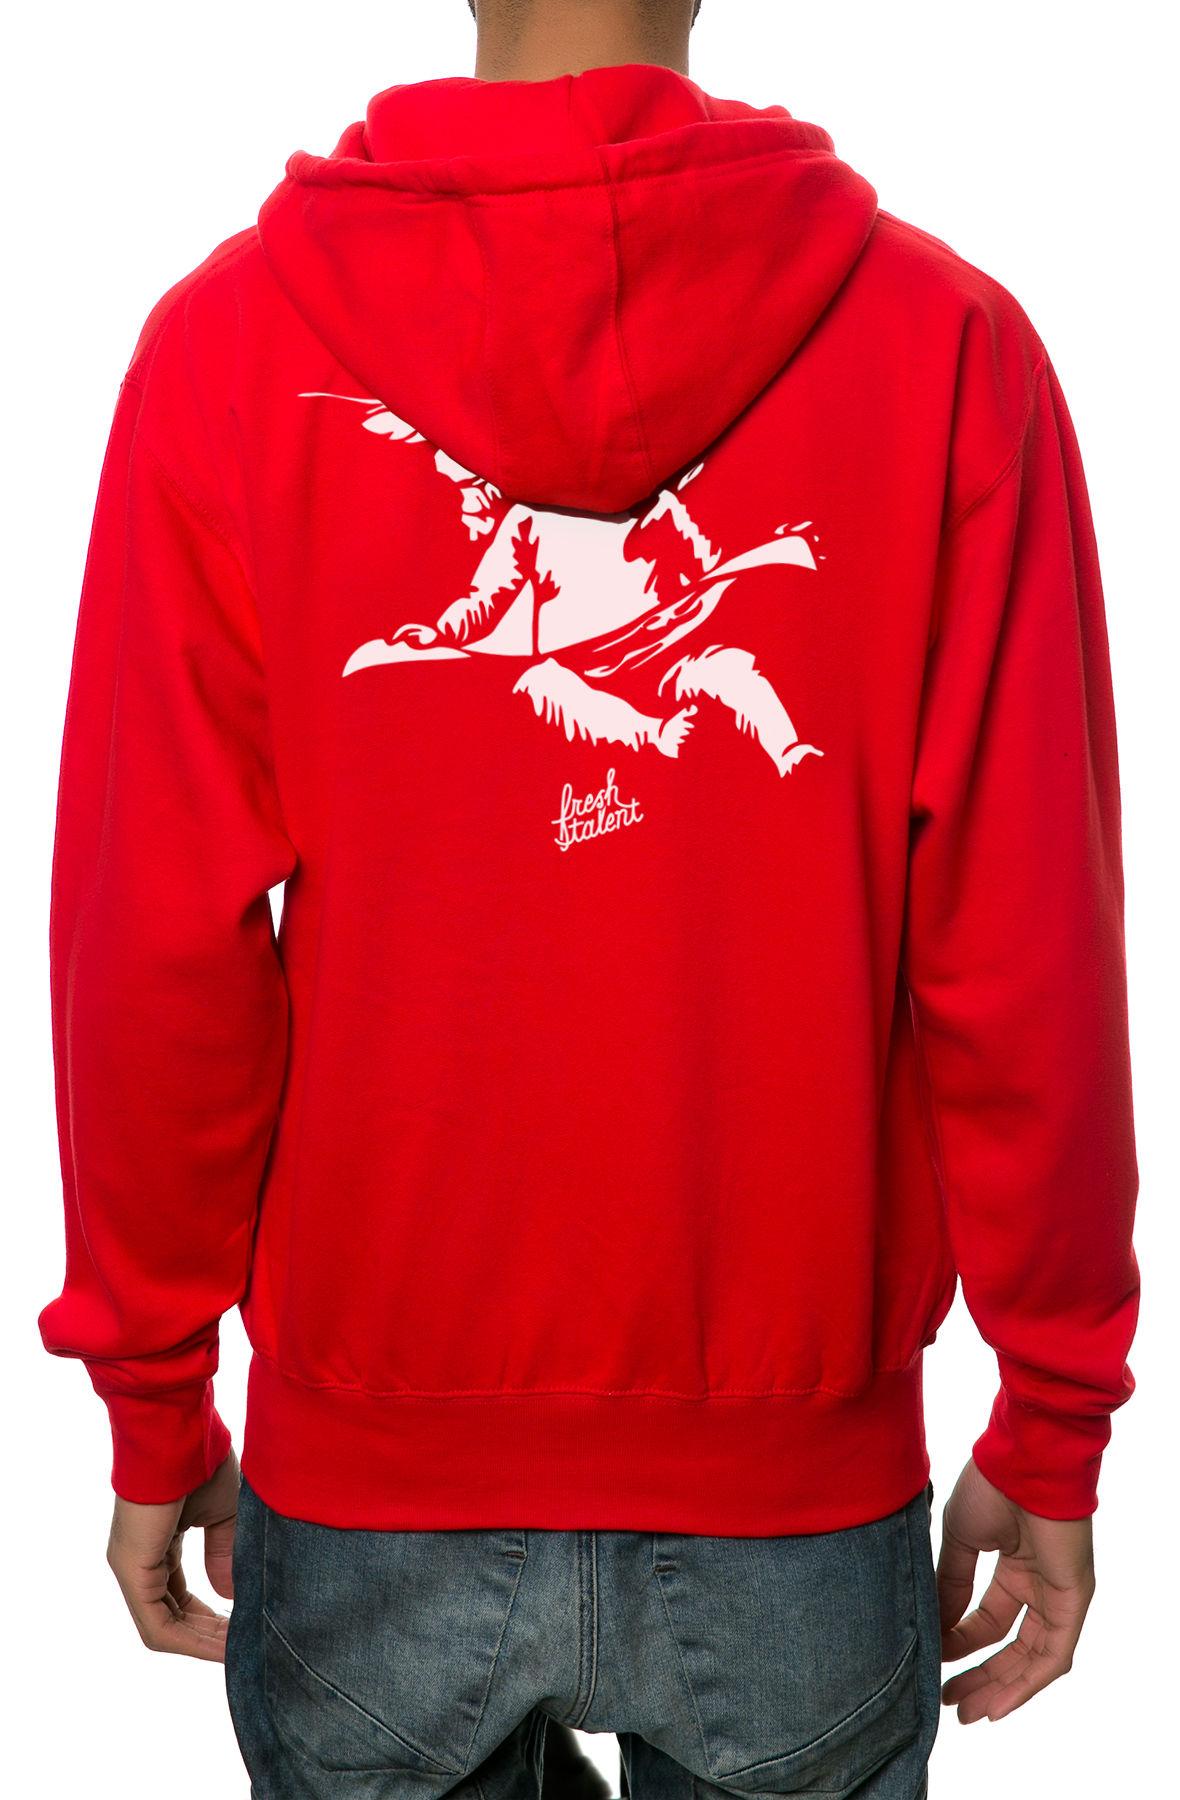 Image of The Cherub Zip-Up Hoodie in Red